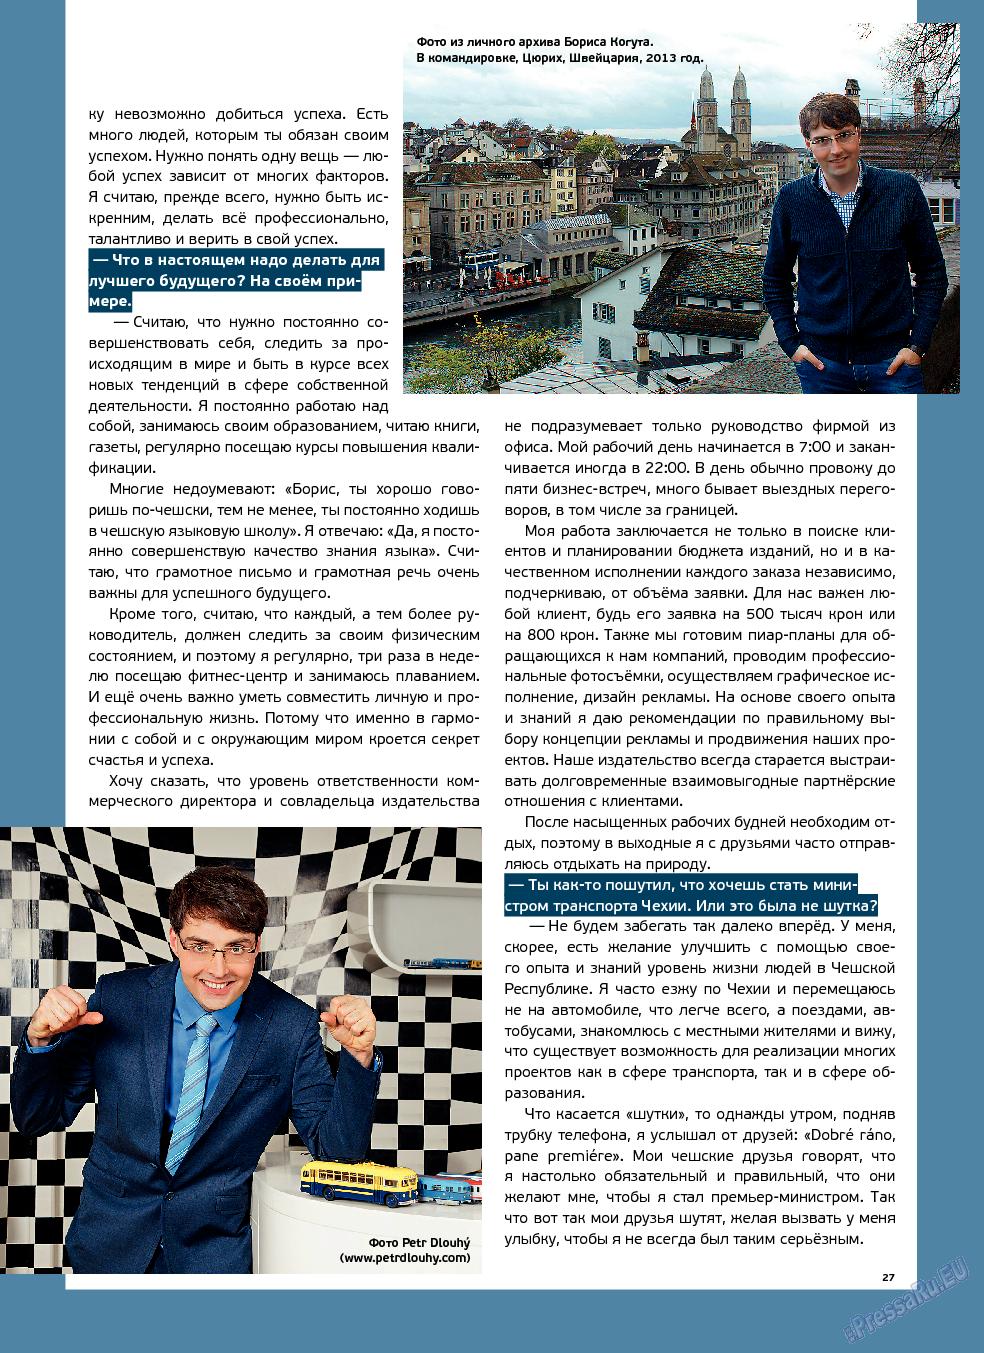 Артек (журнал). 2013 год, номер 5, стр. 29